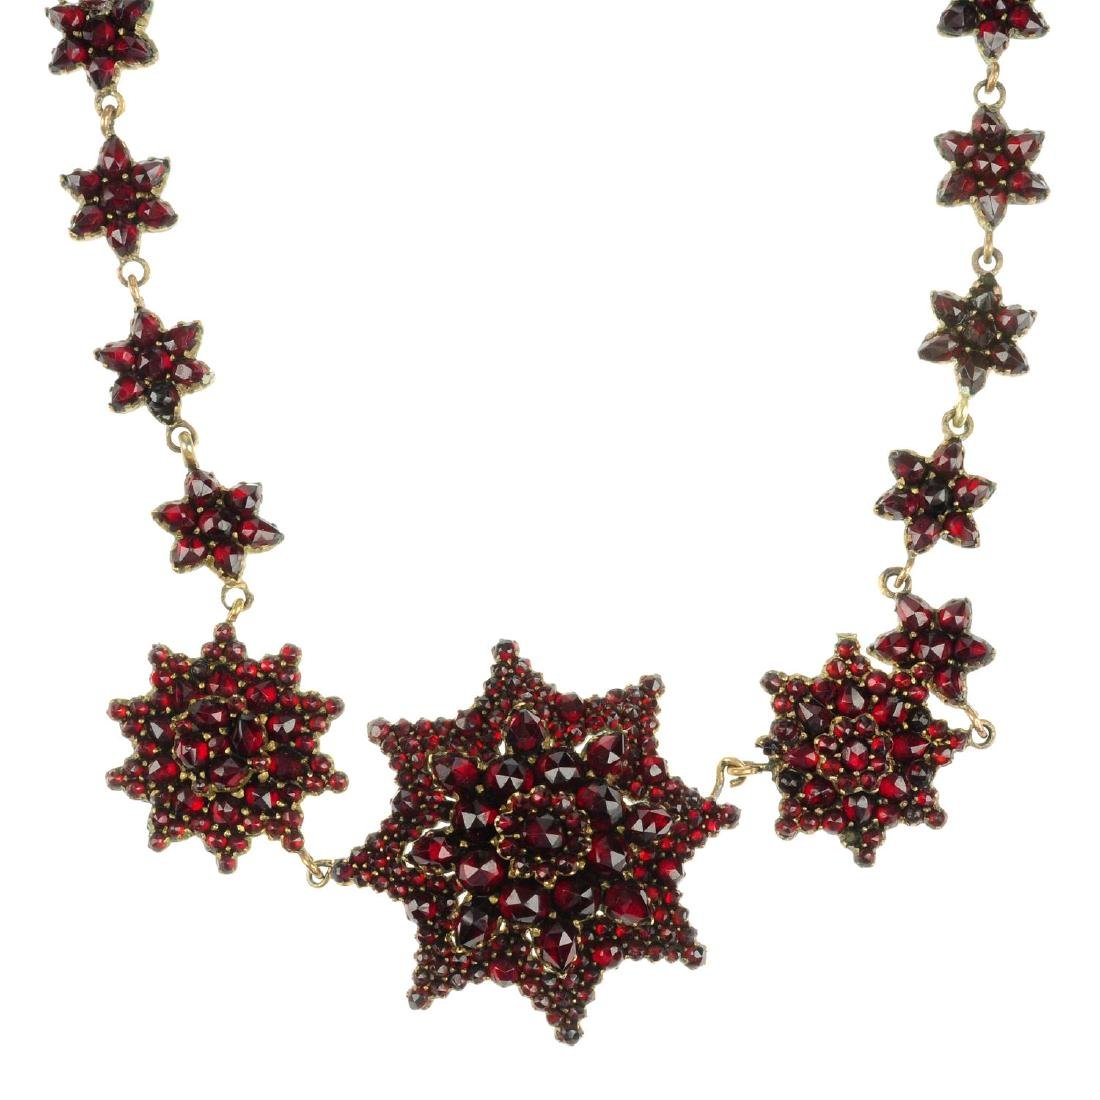 A garnet necklace. Comprising twenty-five star-shape